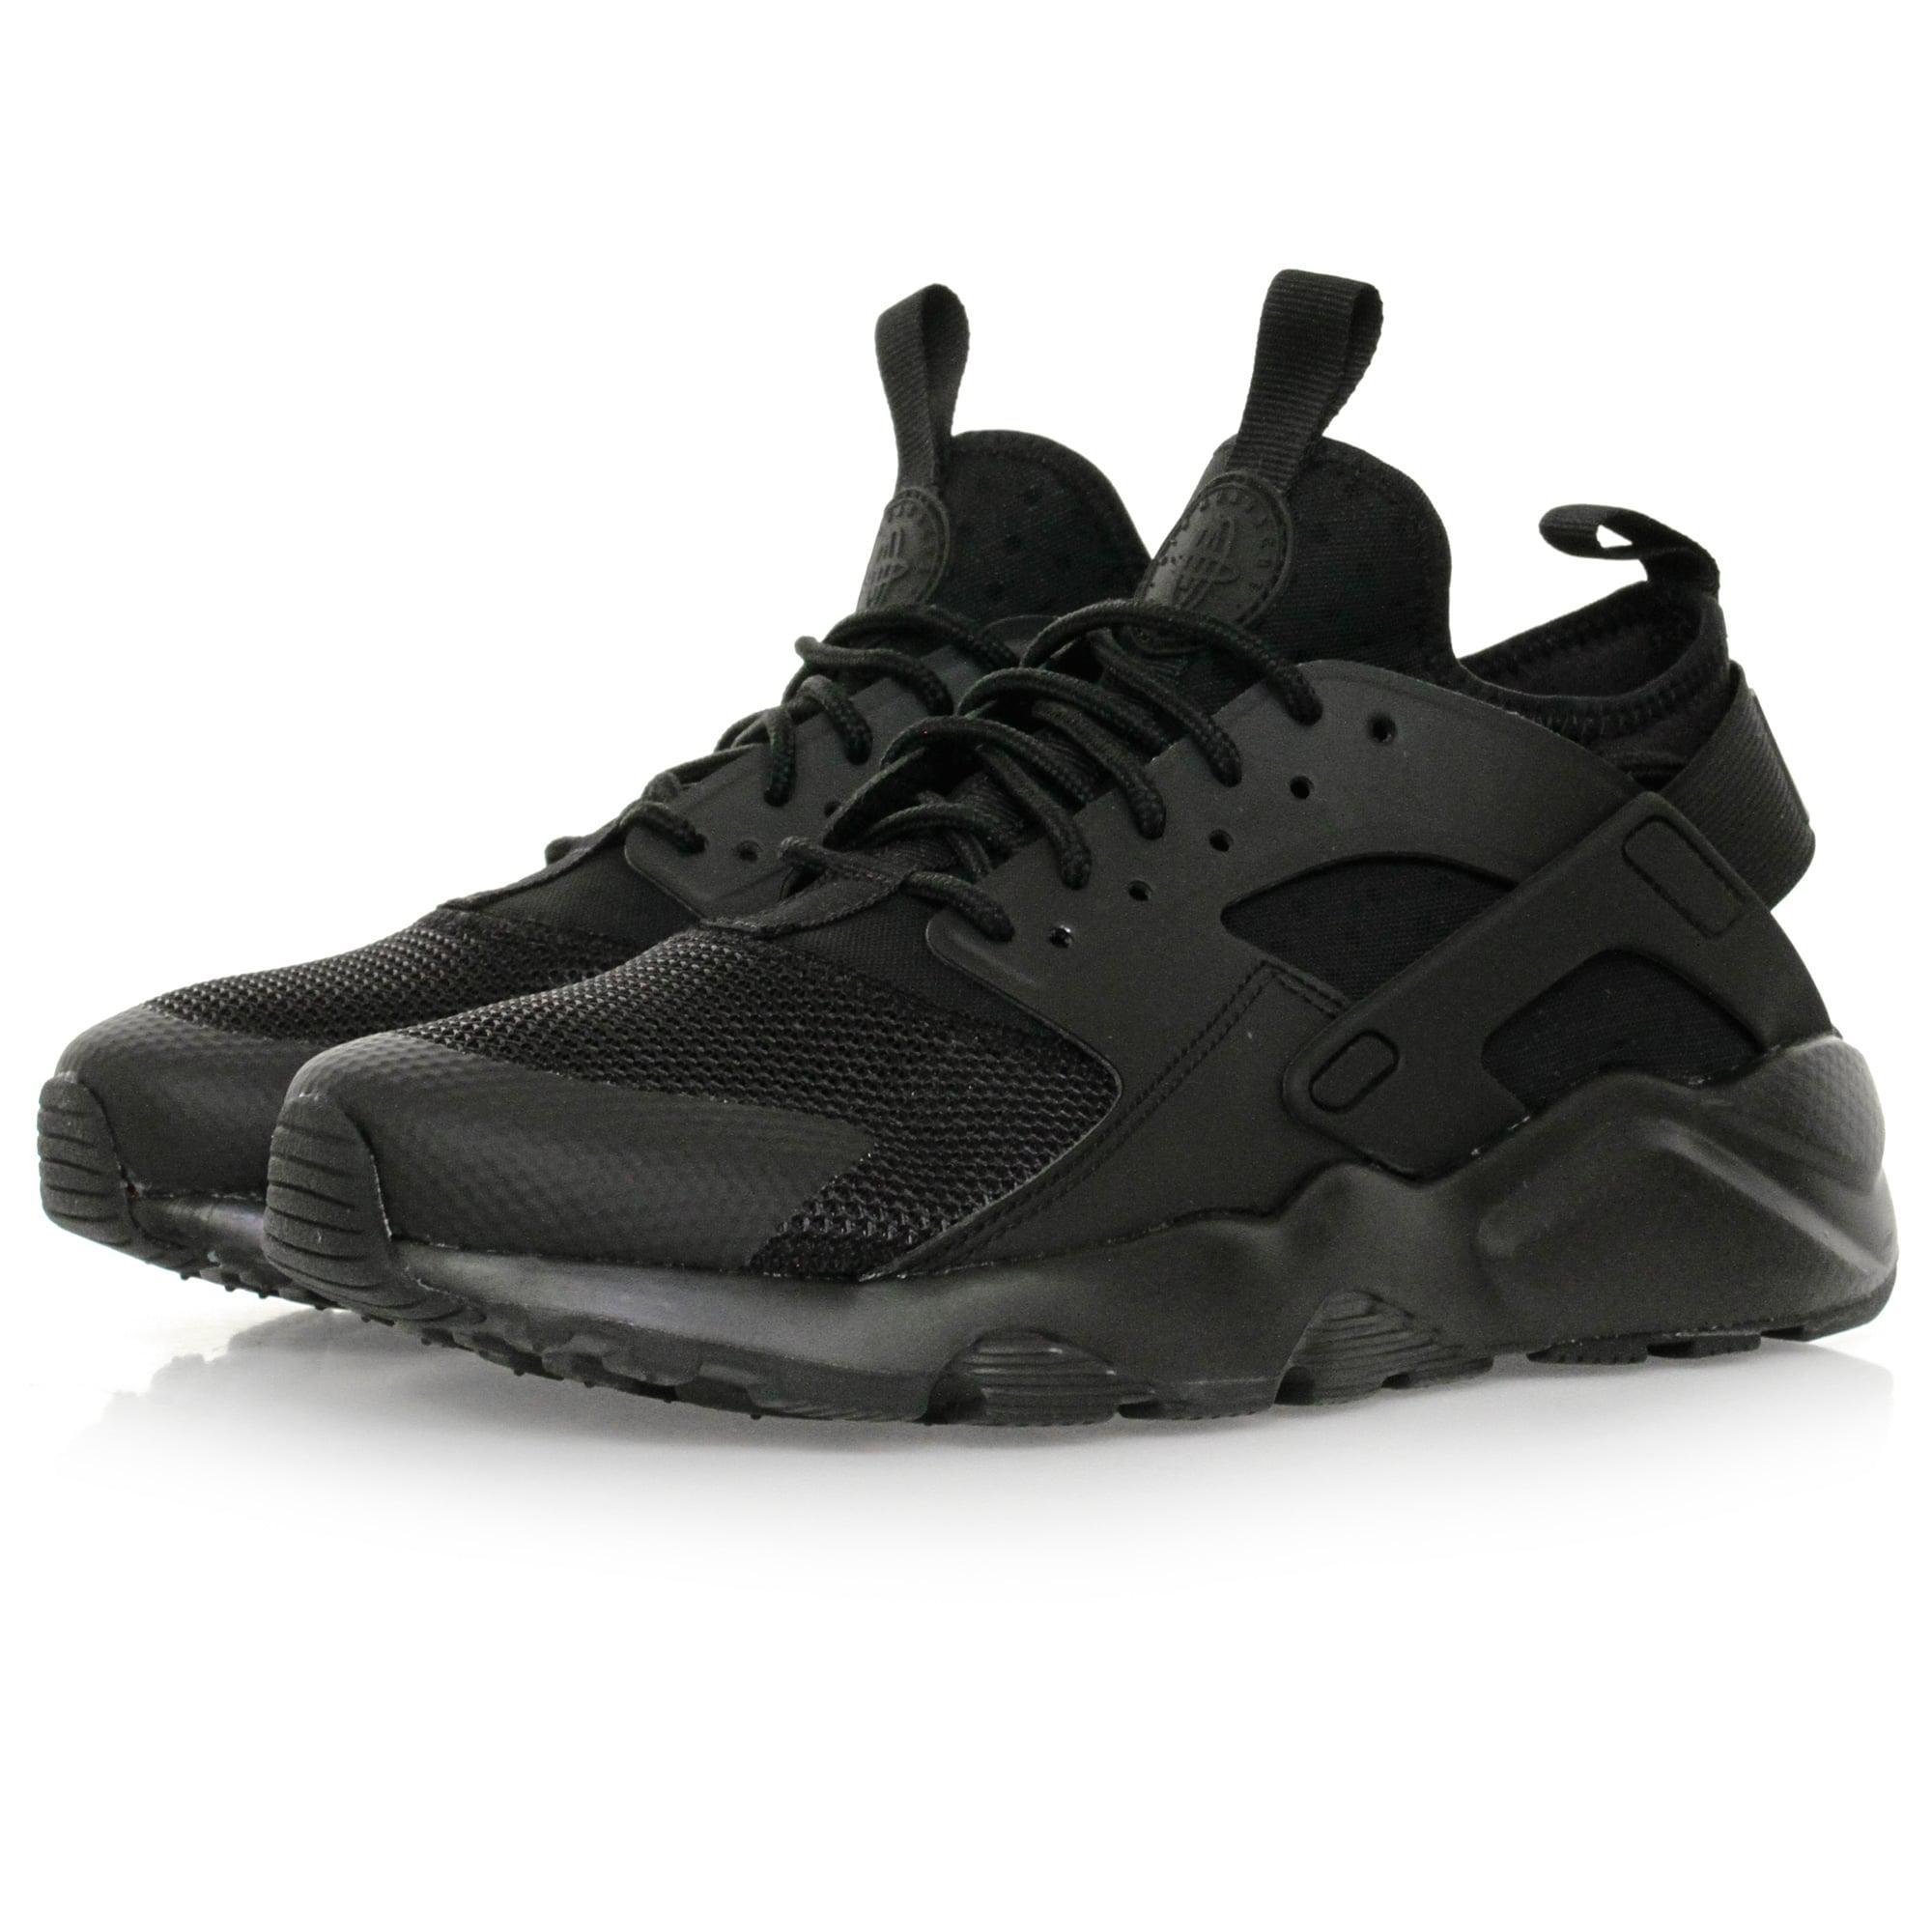 Lyst - Nike Air Huarache Run Ultra Black Shoe 819685 002 in Black ... 710cd0517